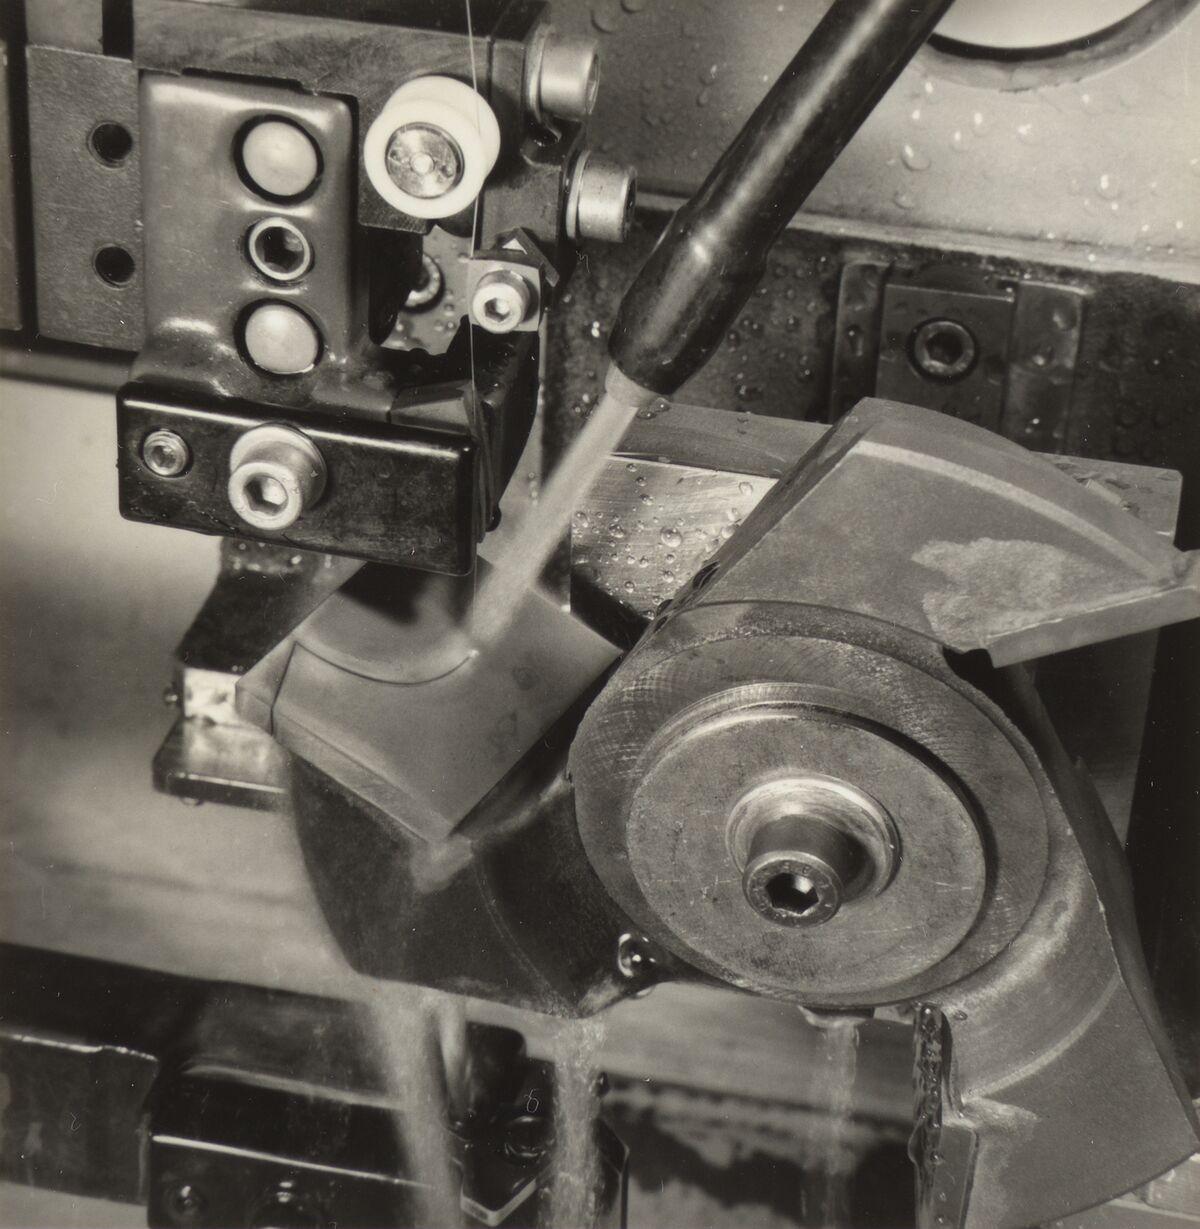 GFA 42/37191: EDM cutting of a profile milling cutter